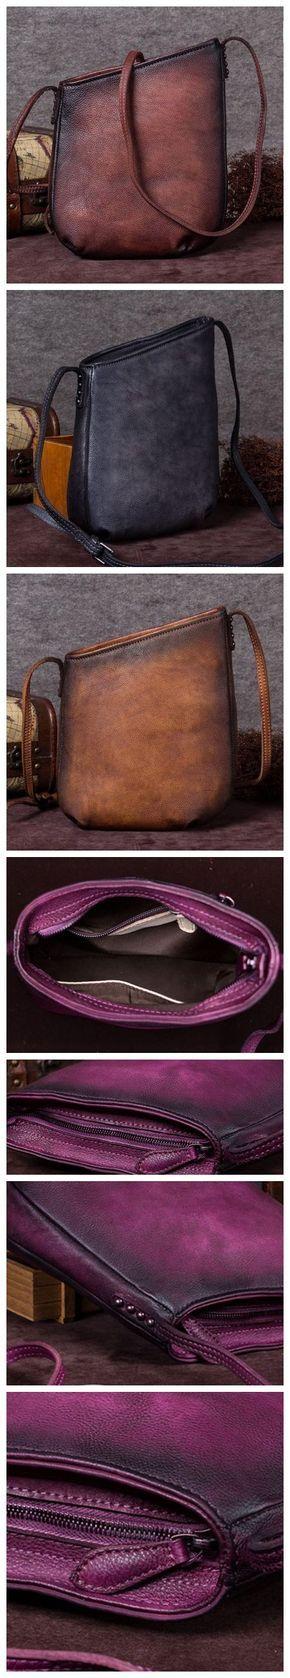 Handmade Full Grain Leather Bucket Bag, Ladies Designer Handbag, Shoulder Bag A0129